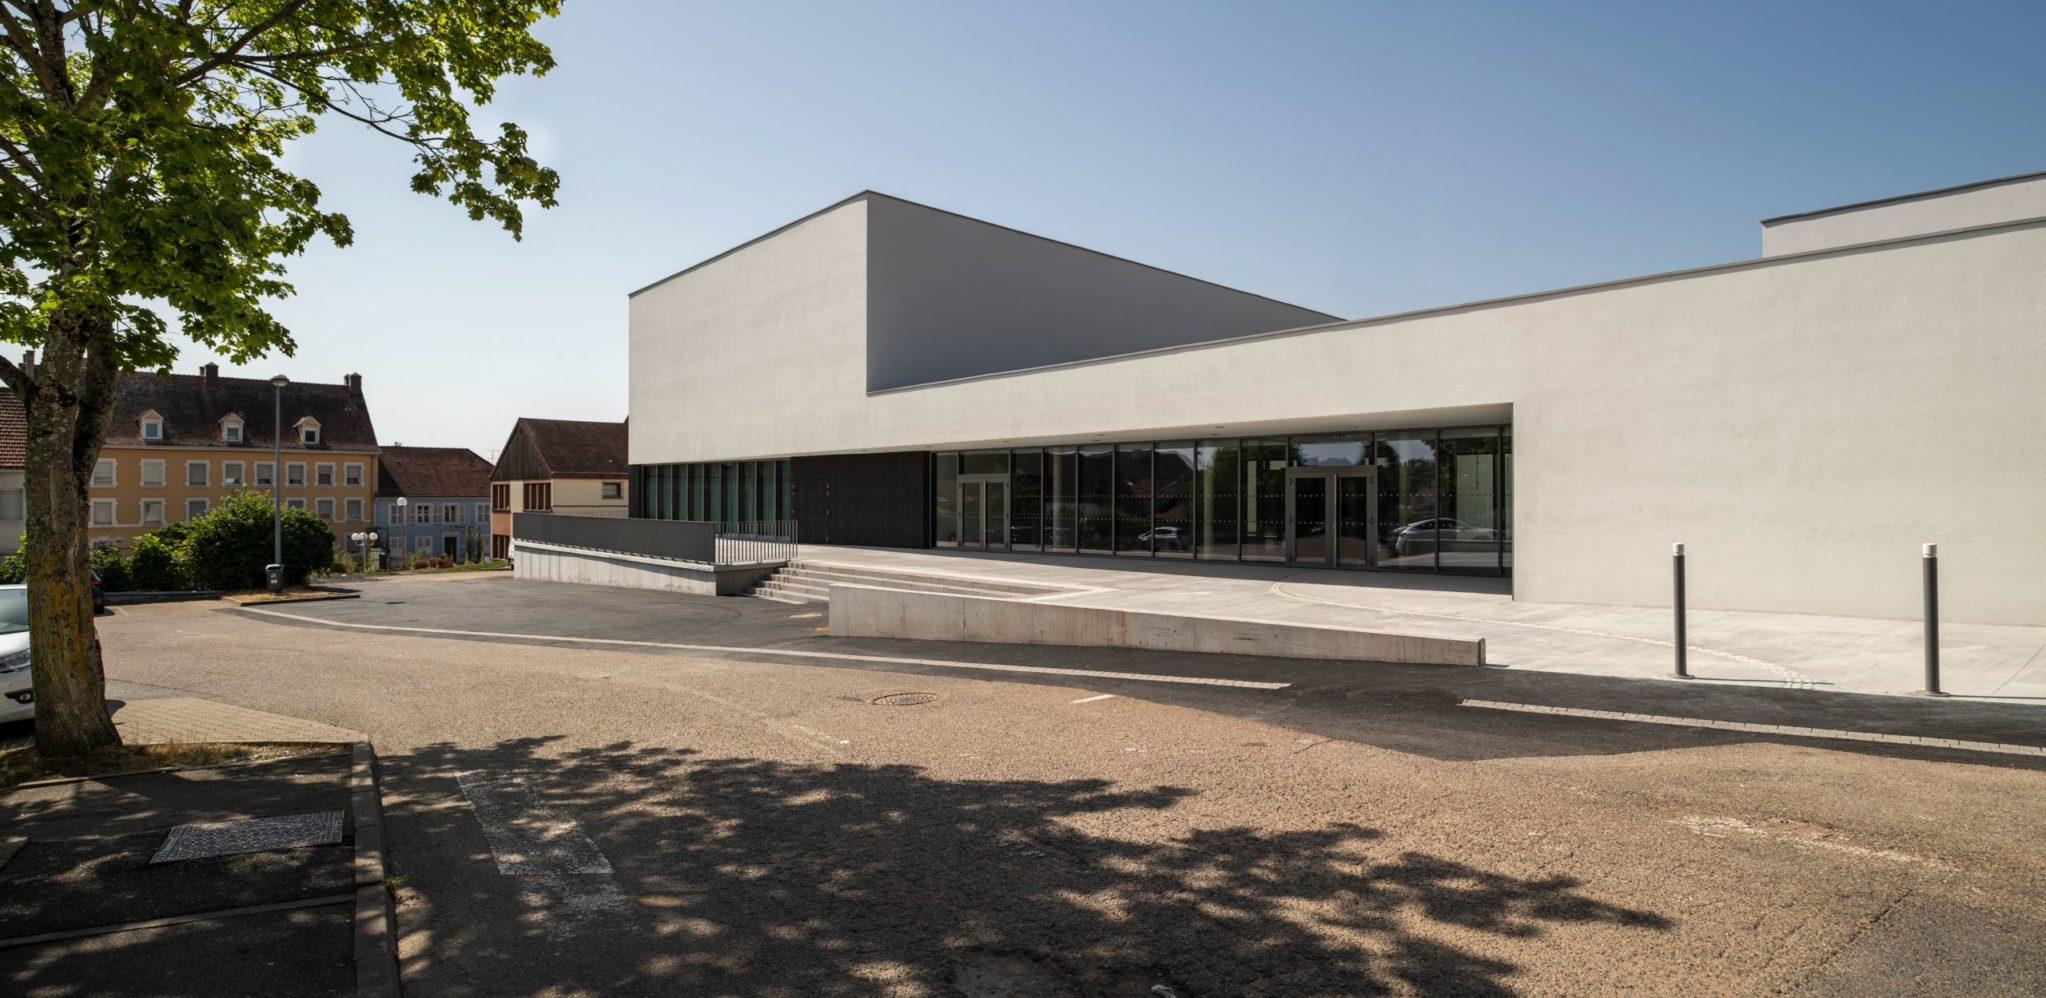 2019 • centre socio-culturel • sarre-union [67]